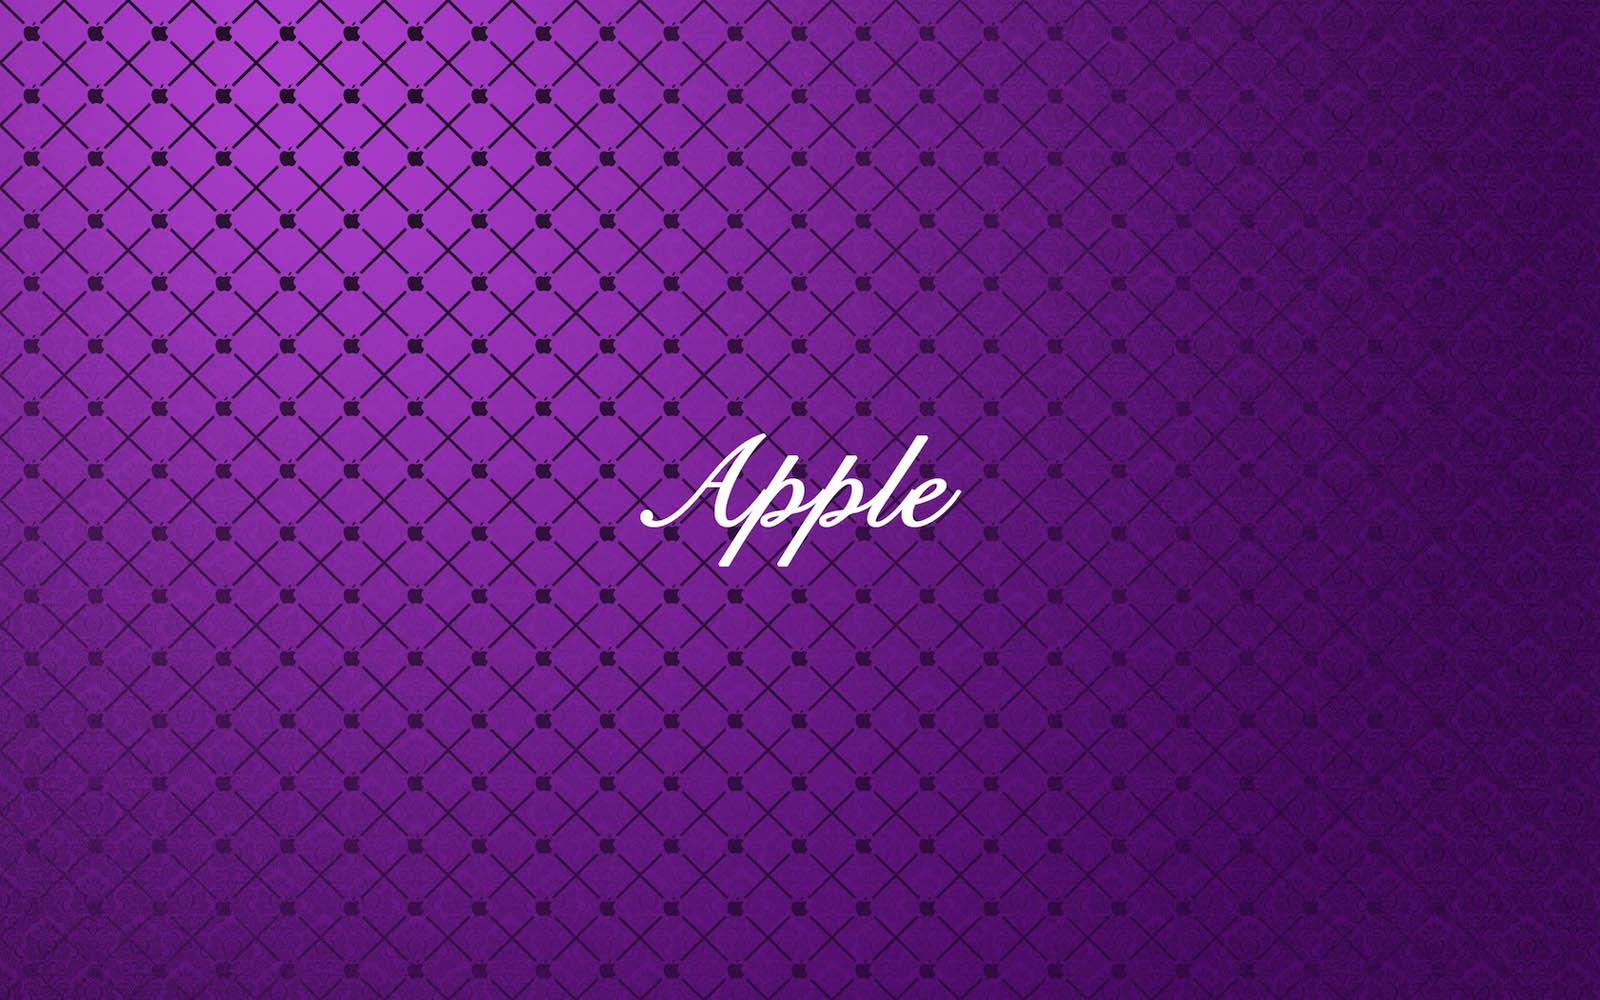 purple wallpapers abstract purple desktop wallpapers abstract purple 1600x1000